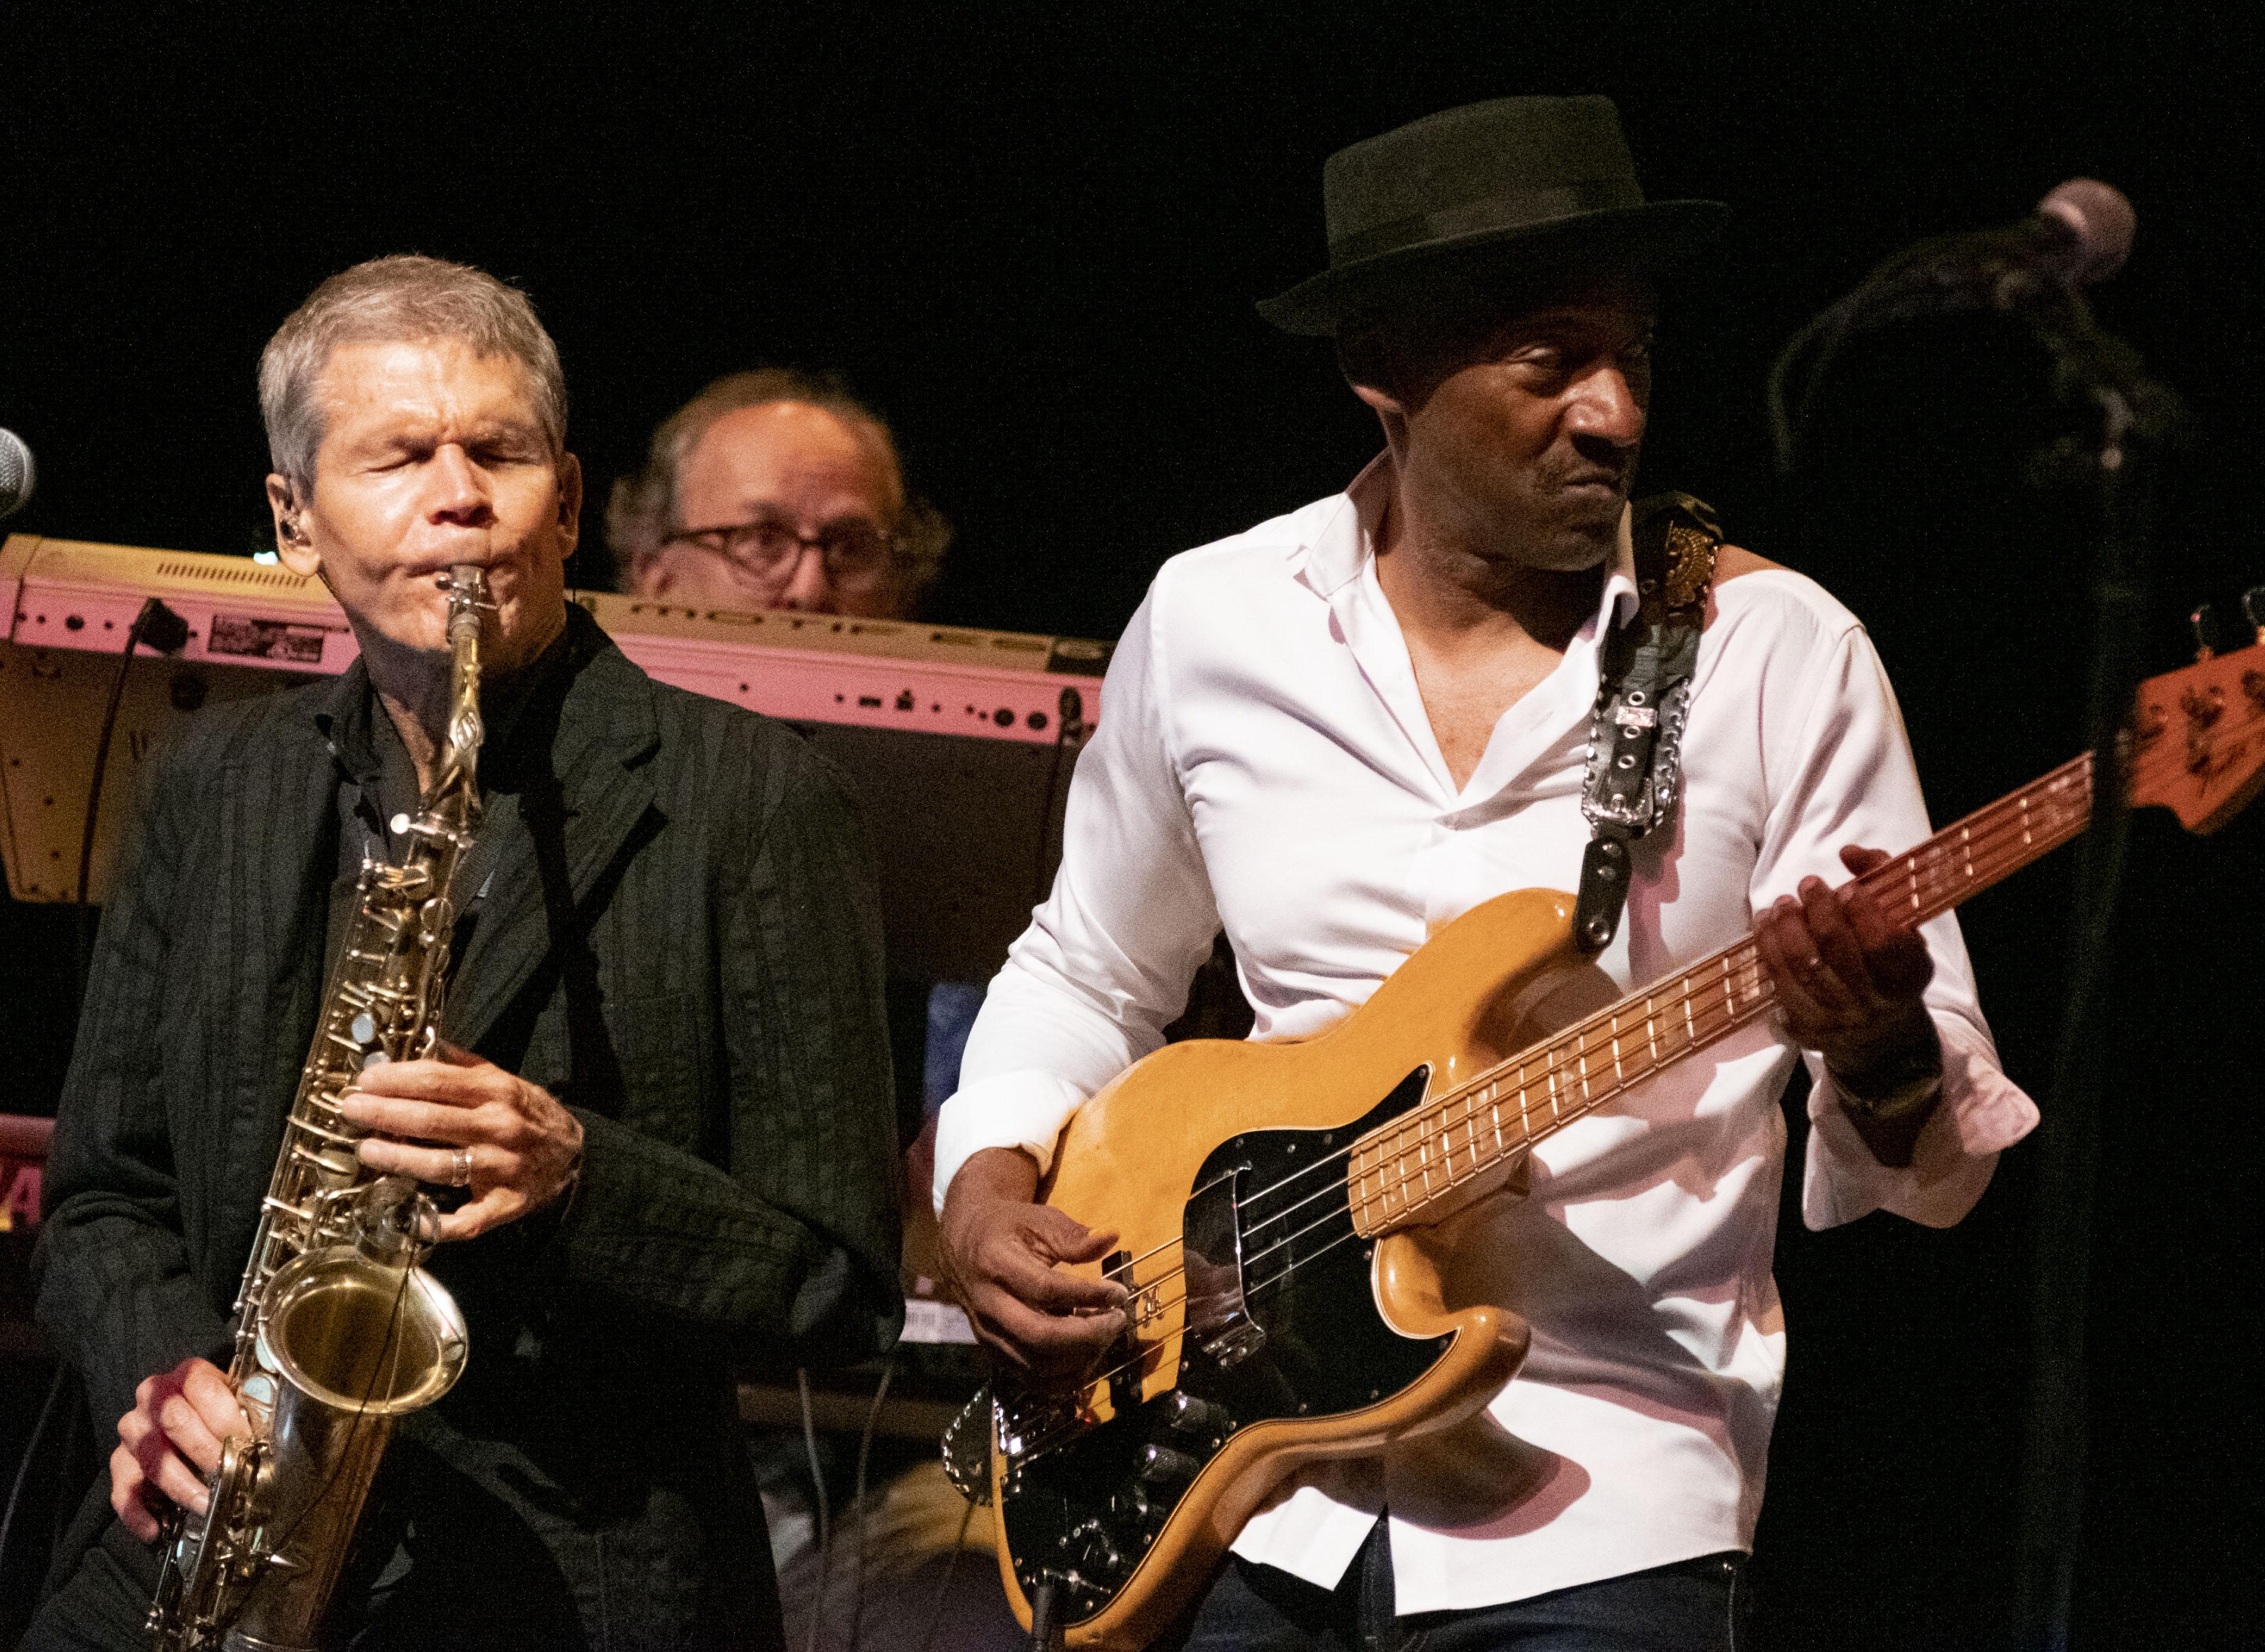 David Sanborn and Marcus Miller